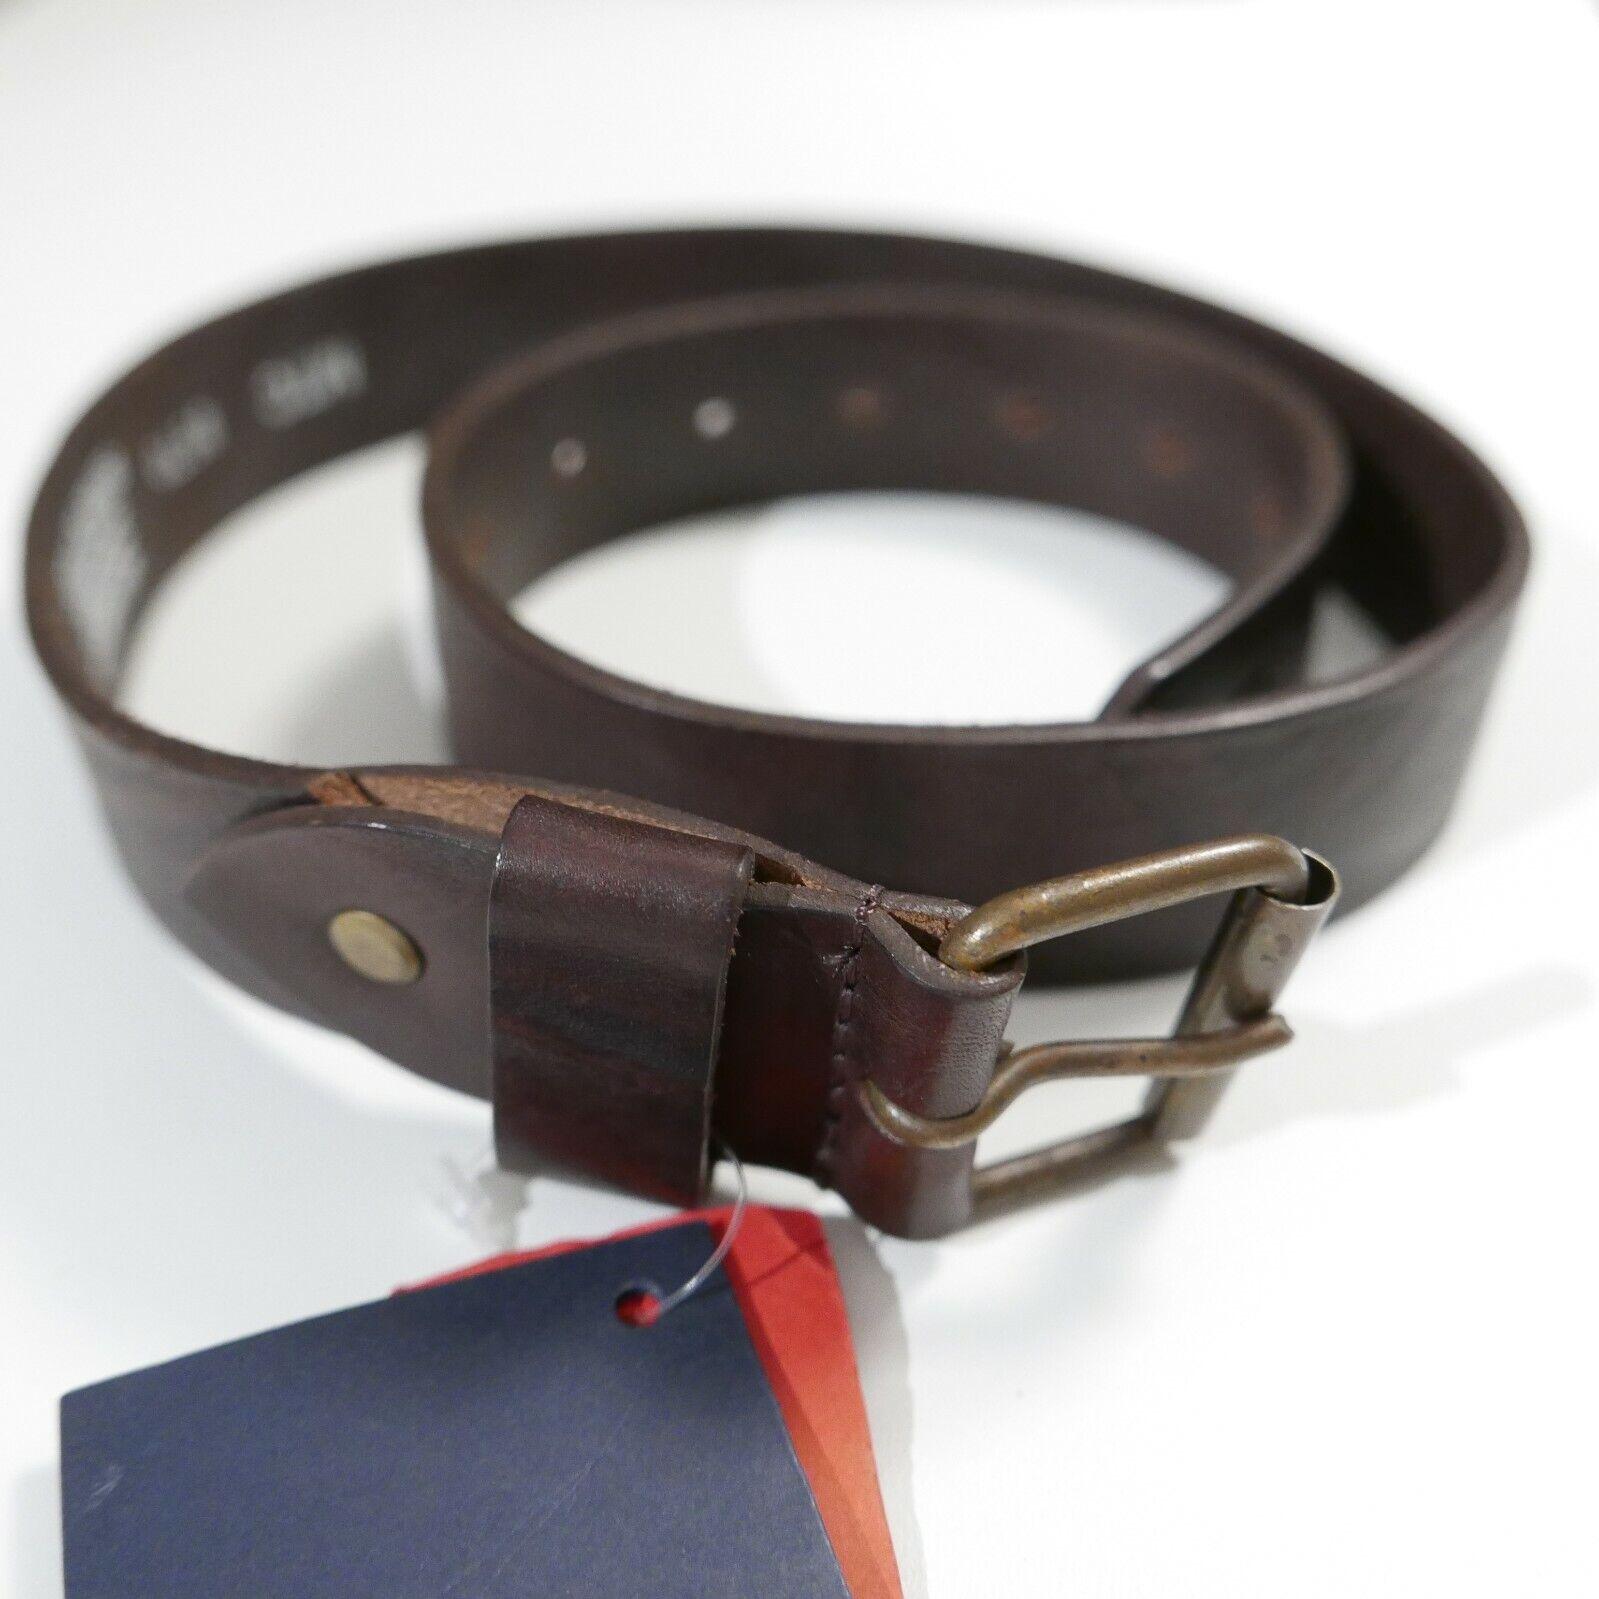 #AX01 Belt Serge Blanco Size 75 NEW